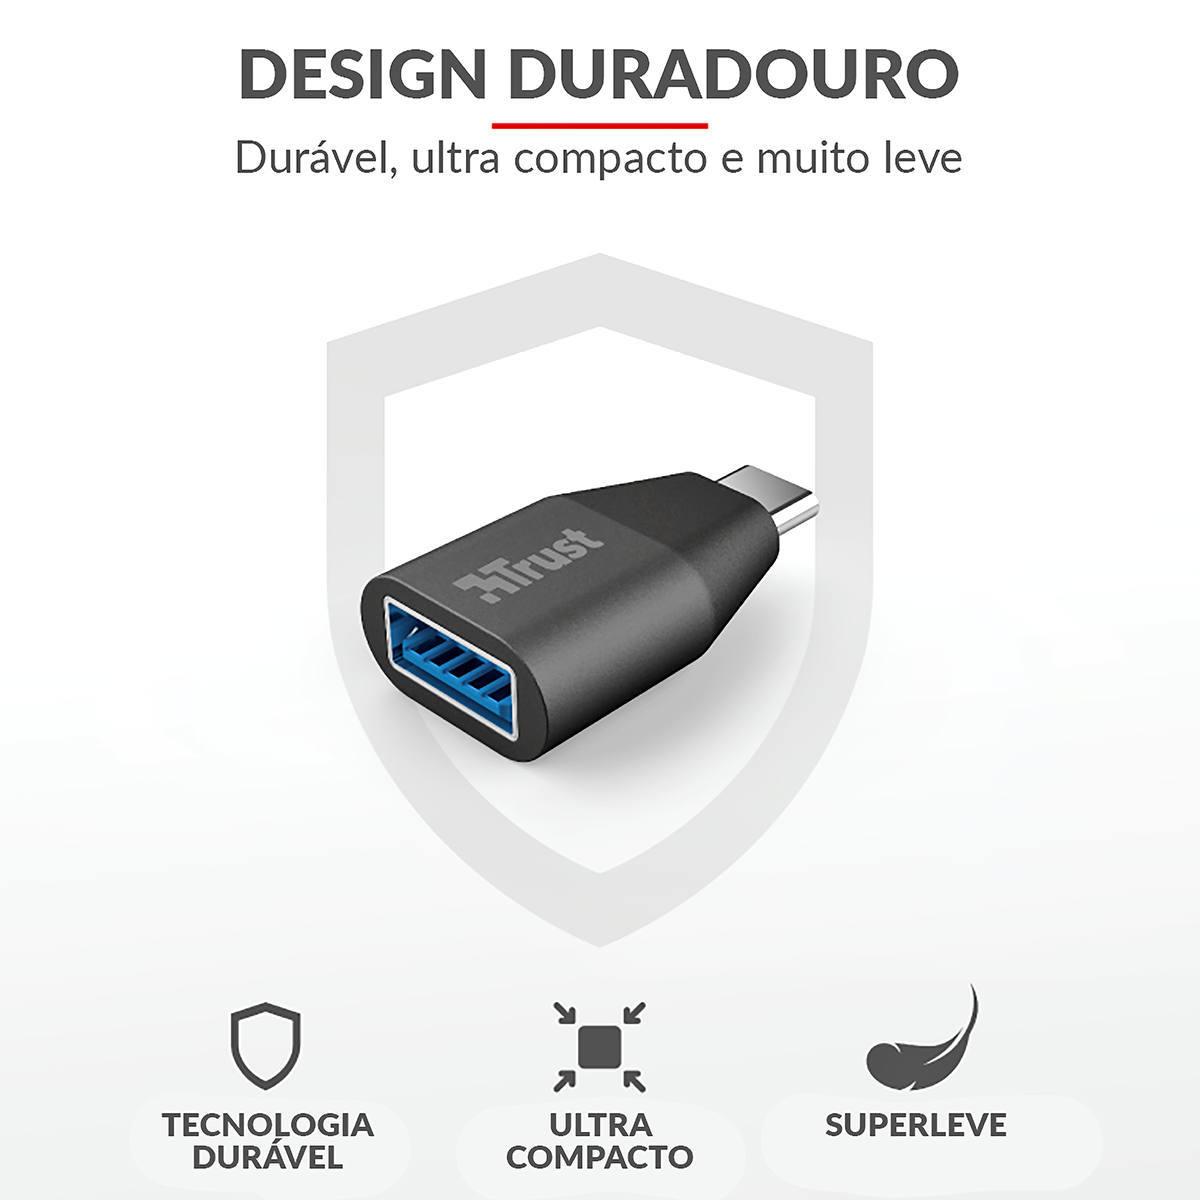 Adaptador USB Tipo-C para USB 3.1 Tipo A Ultra Compacto Trust Calyx